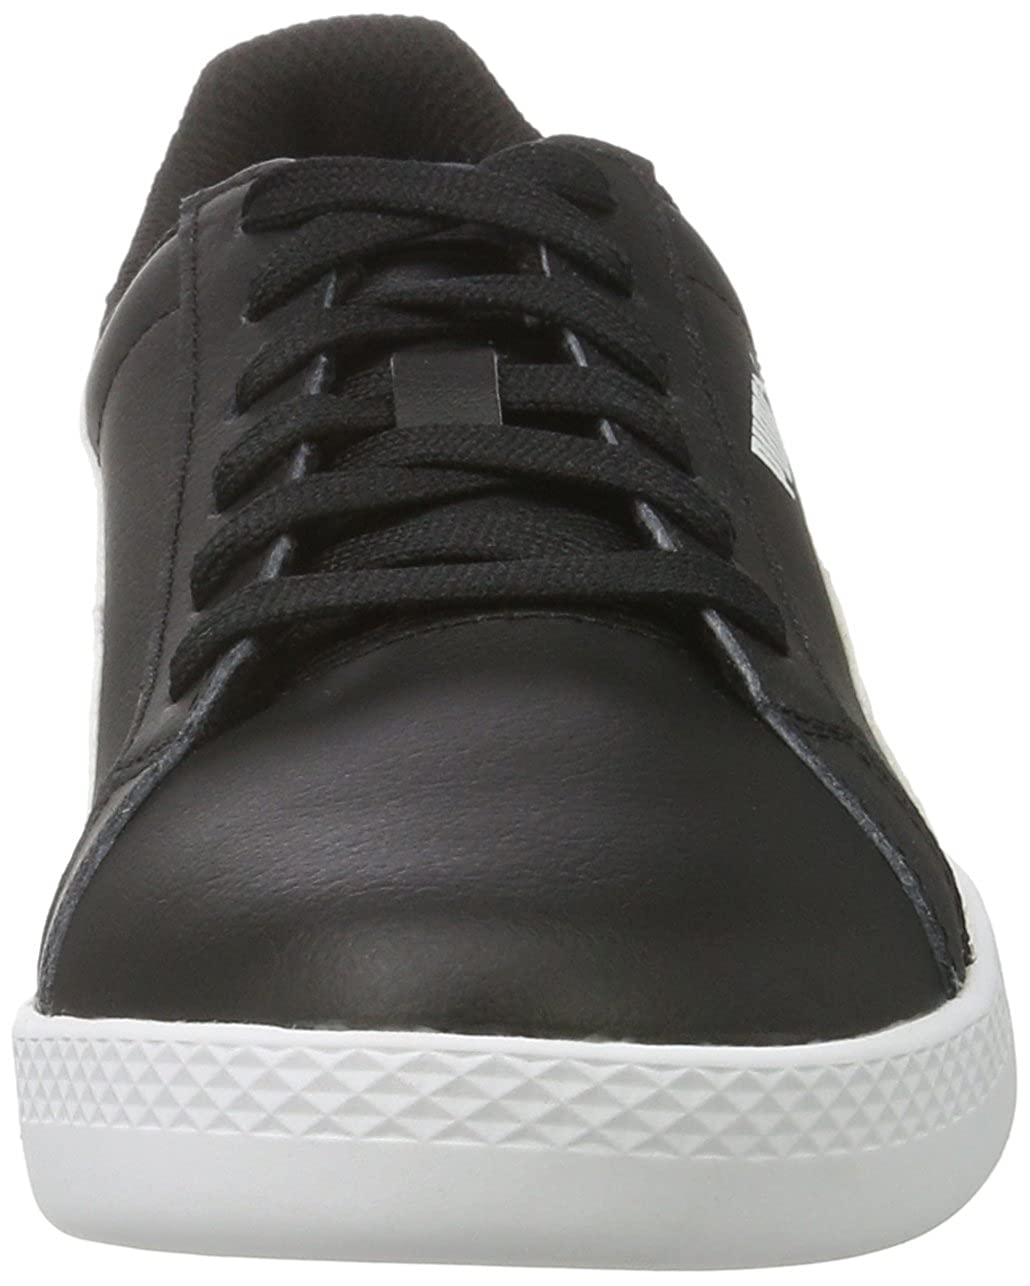 Puma Schwarz Damen Smash L Sneakers Schwarz Puma (schwarz/Weiß 01) e37056